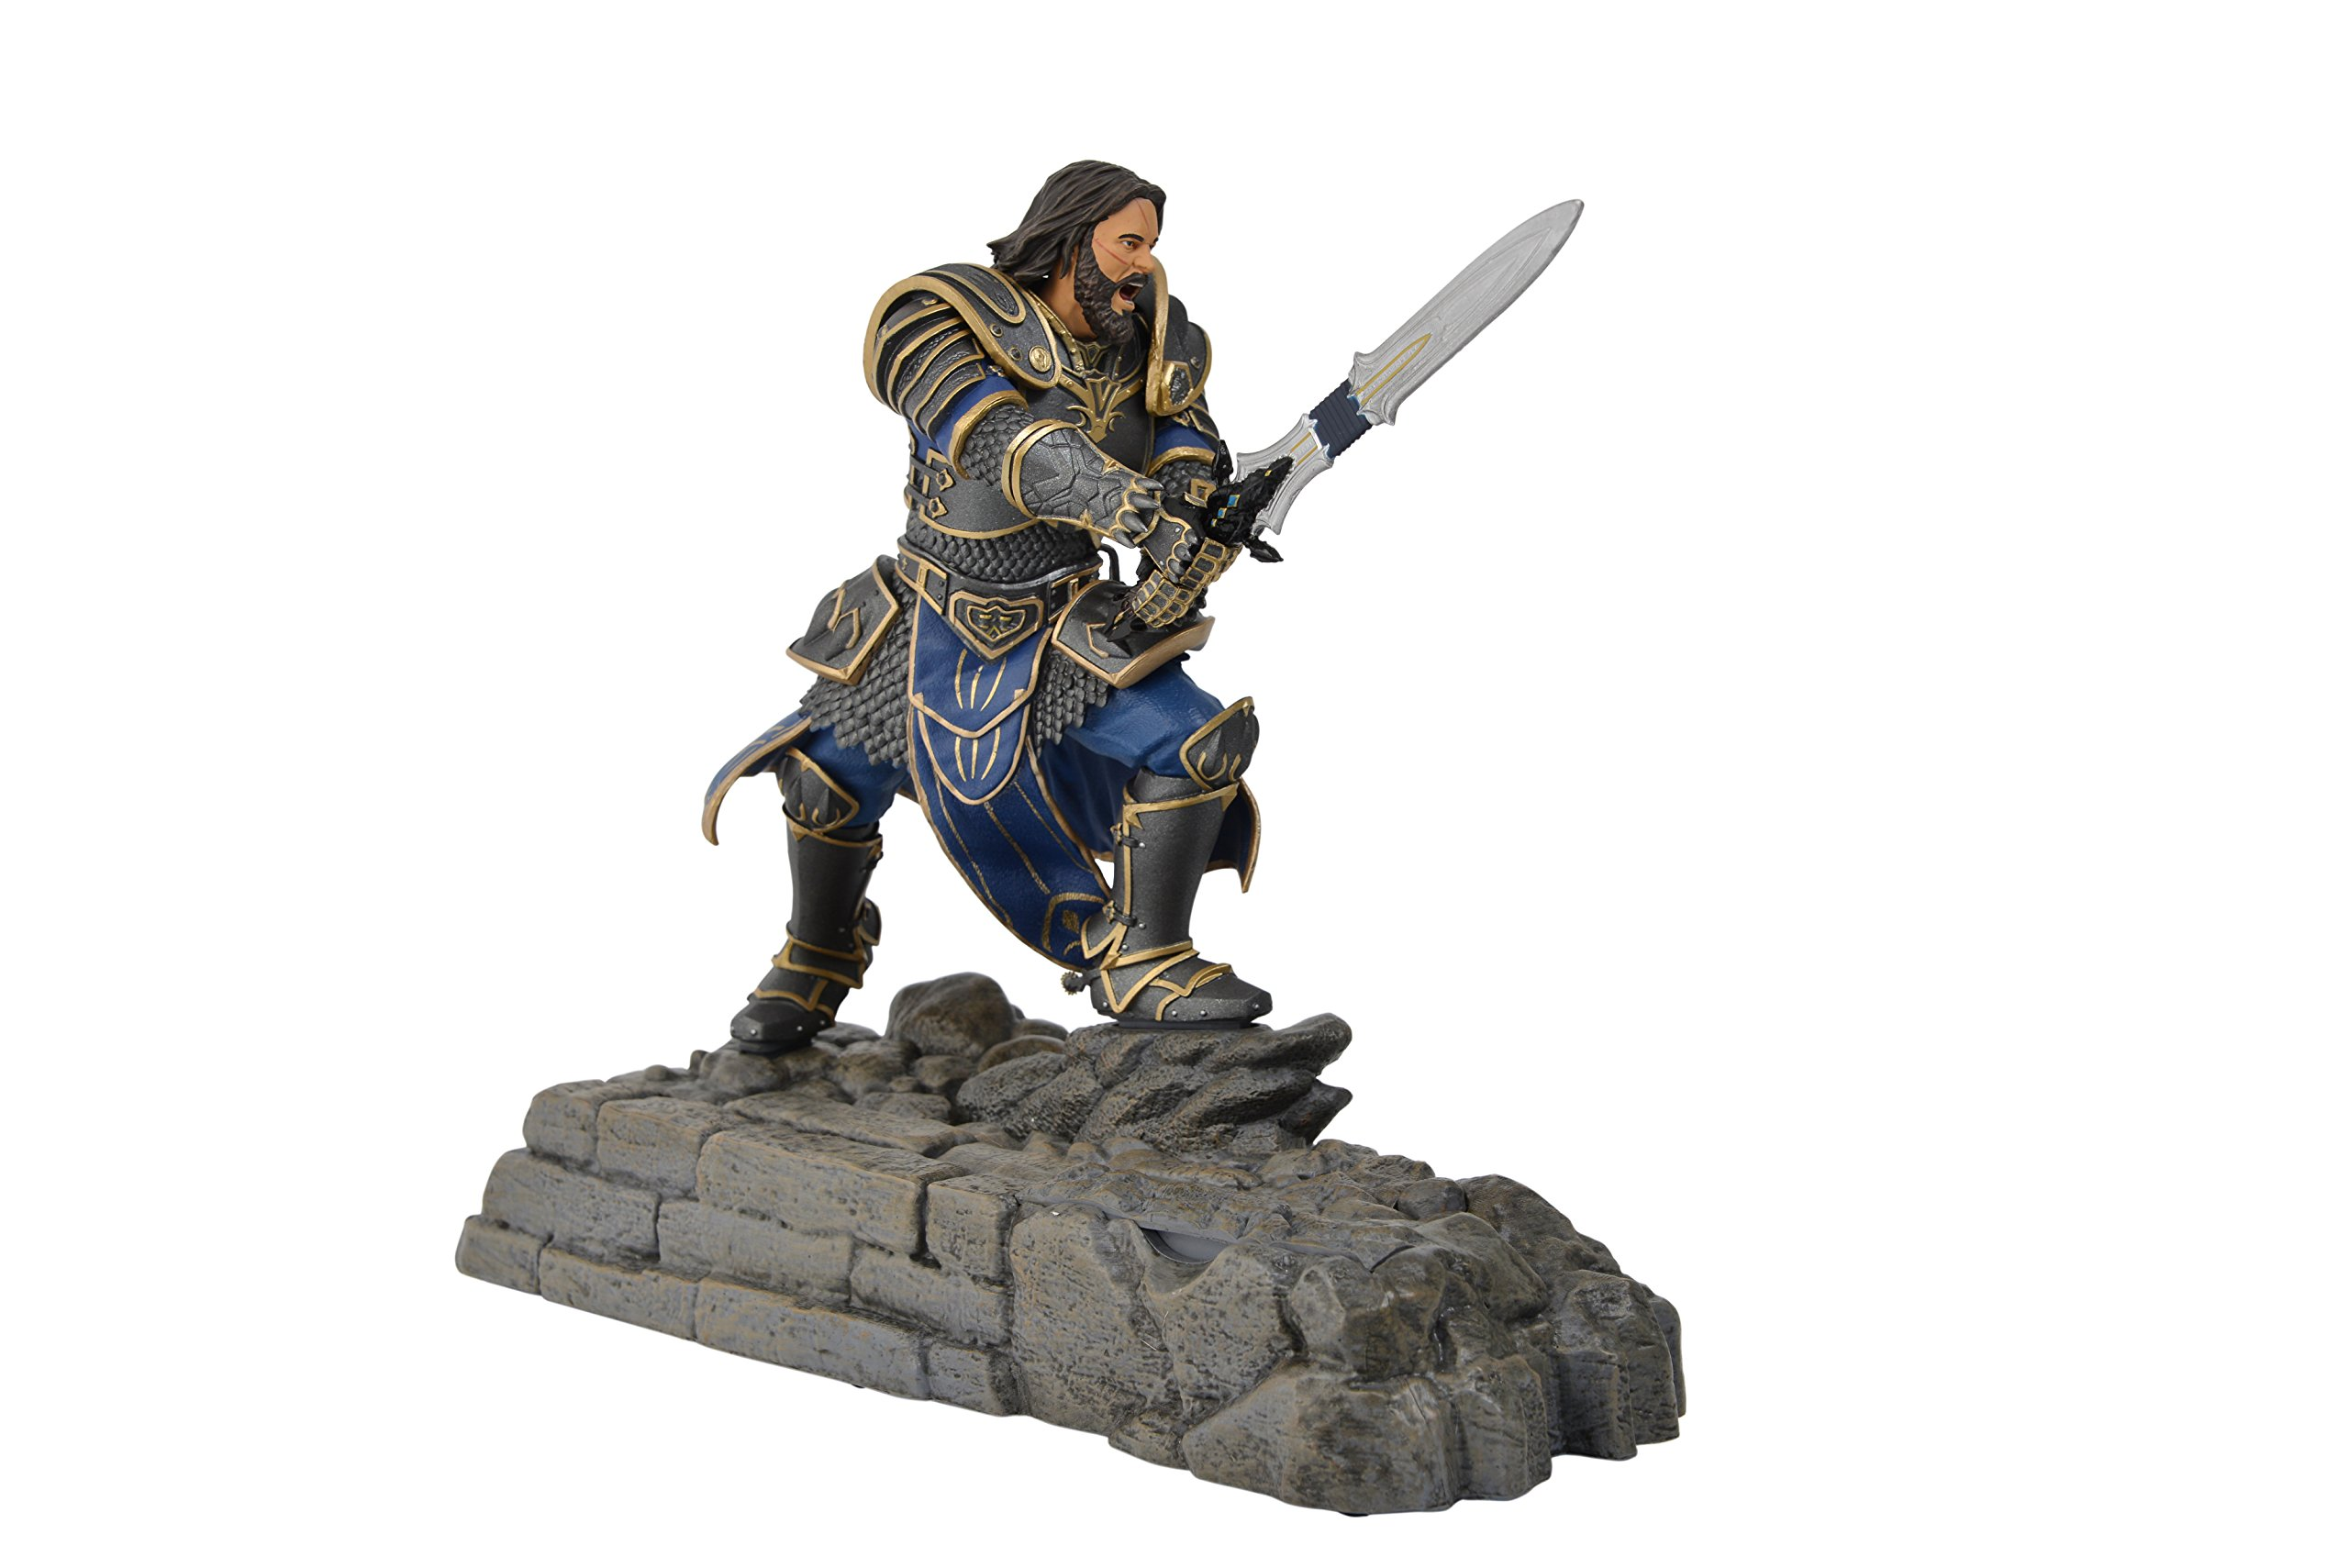 Swordfish Tech Warcraft, Lothar Statue Phone Charging Dock - Warcraft Movie Official Licensed